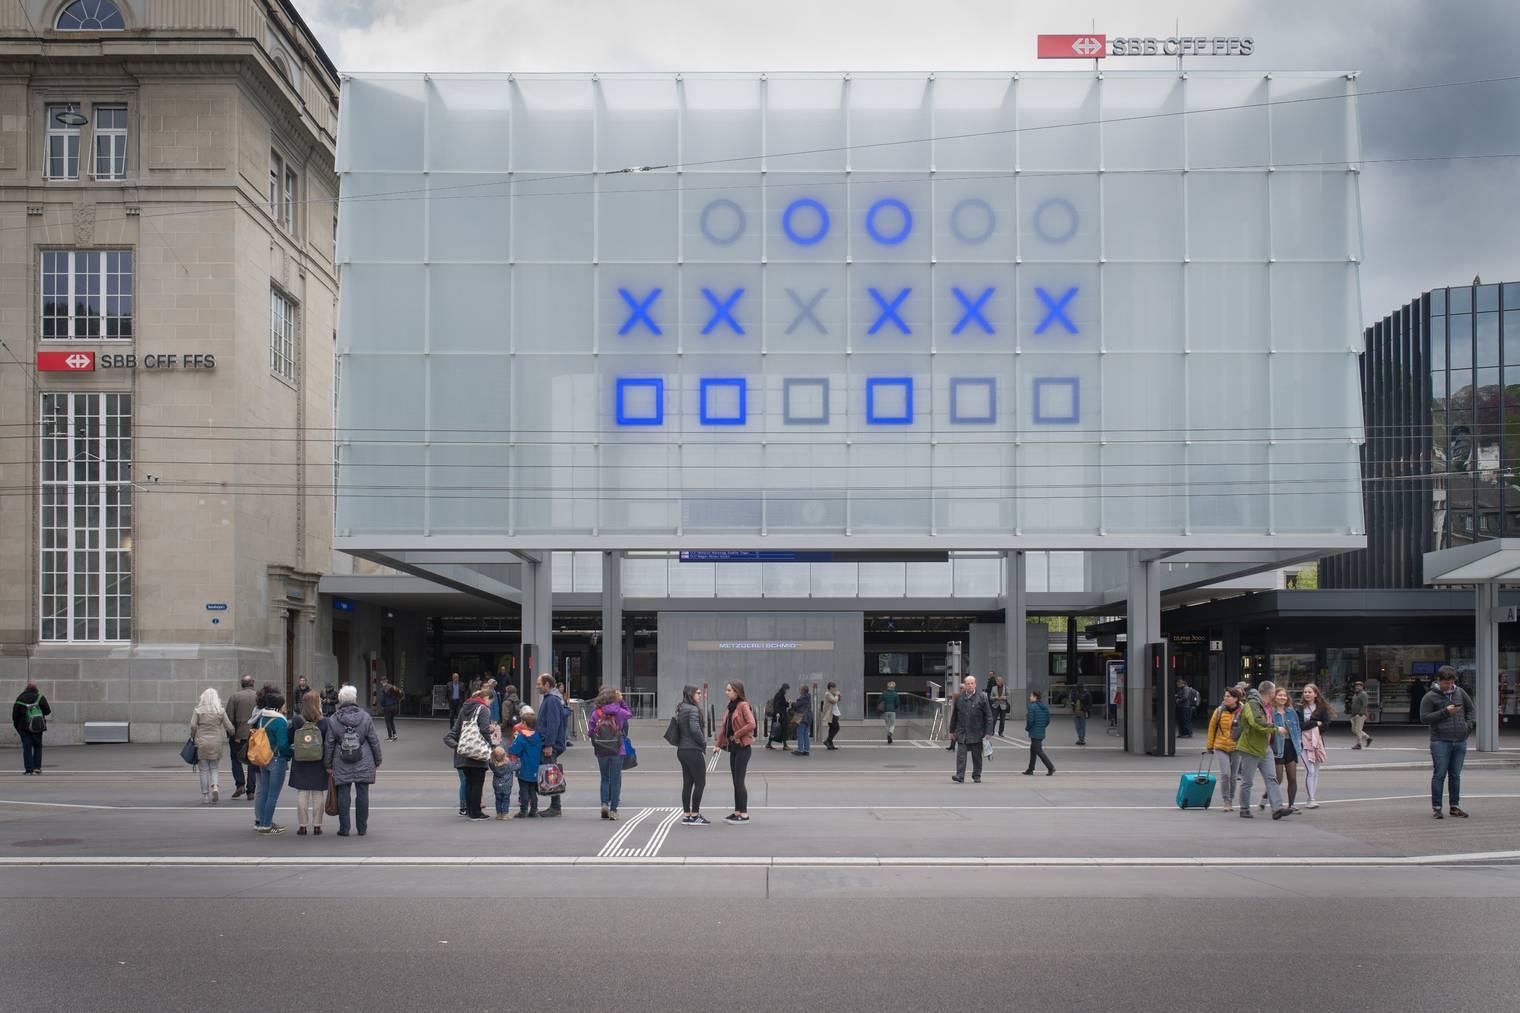 Die binäre Uhr am Bahnhof St.Gallen. (Bild: Benjamin Manser/St.Galler Tagblatt)